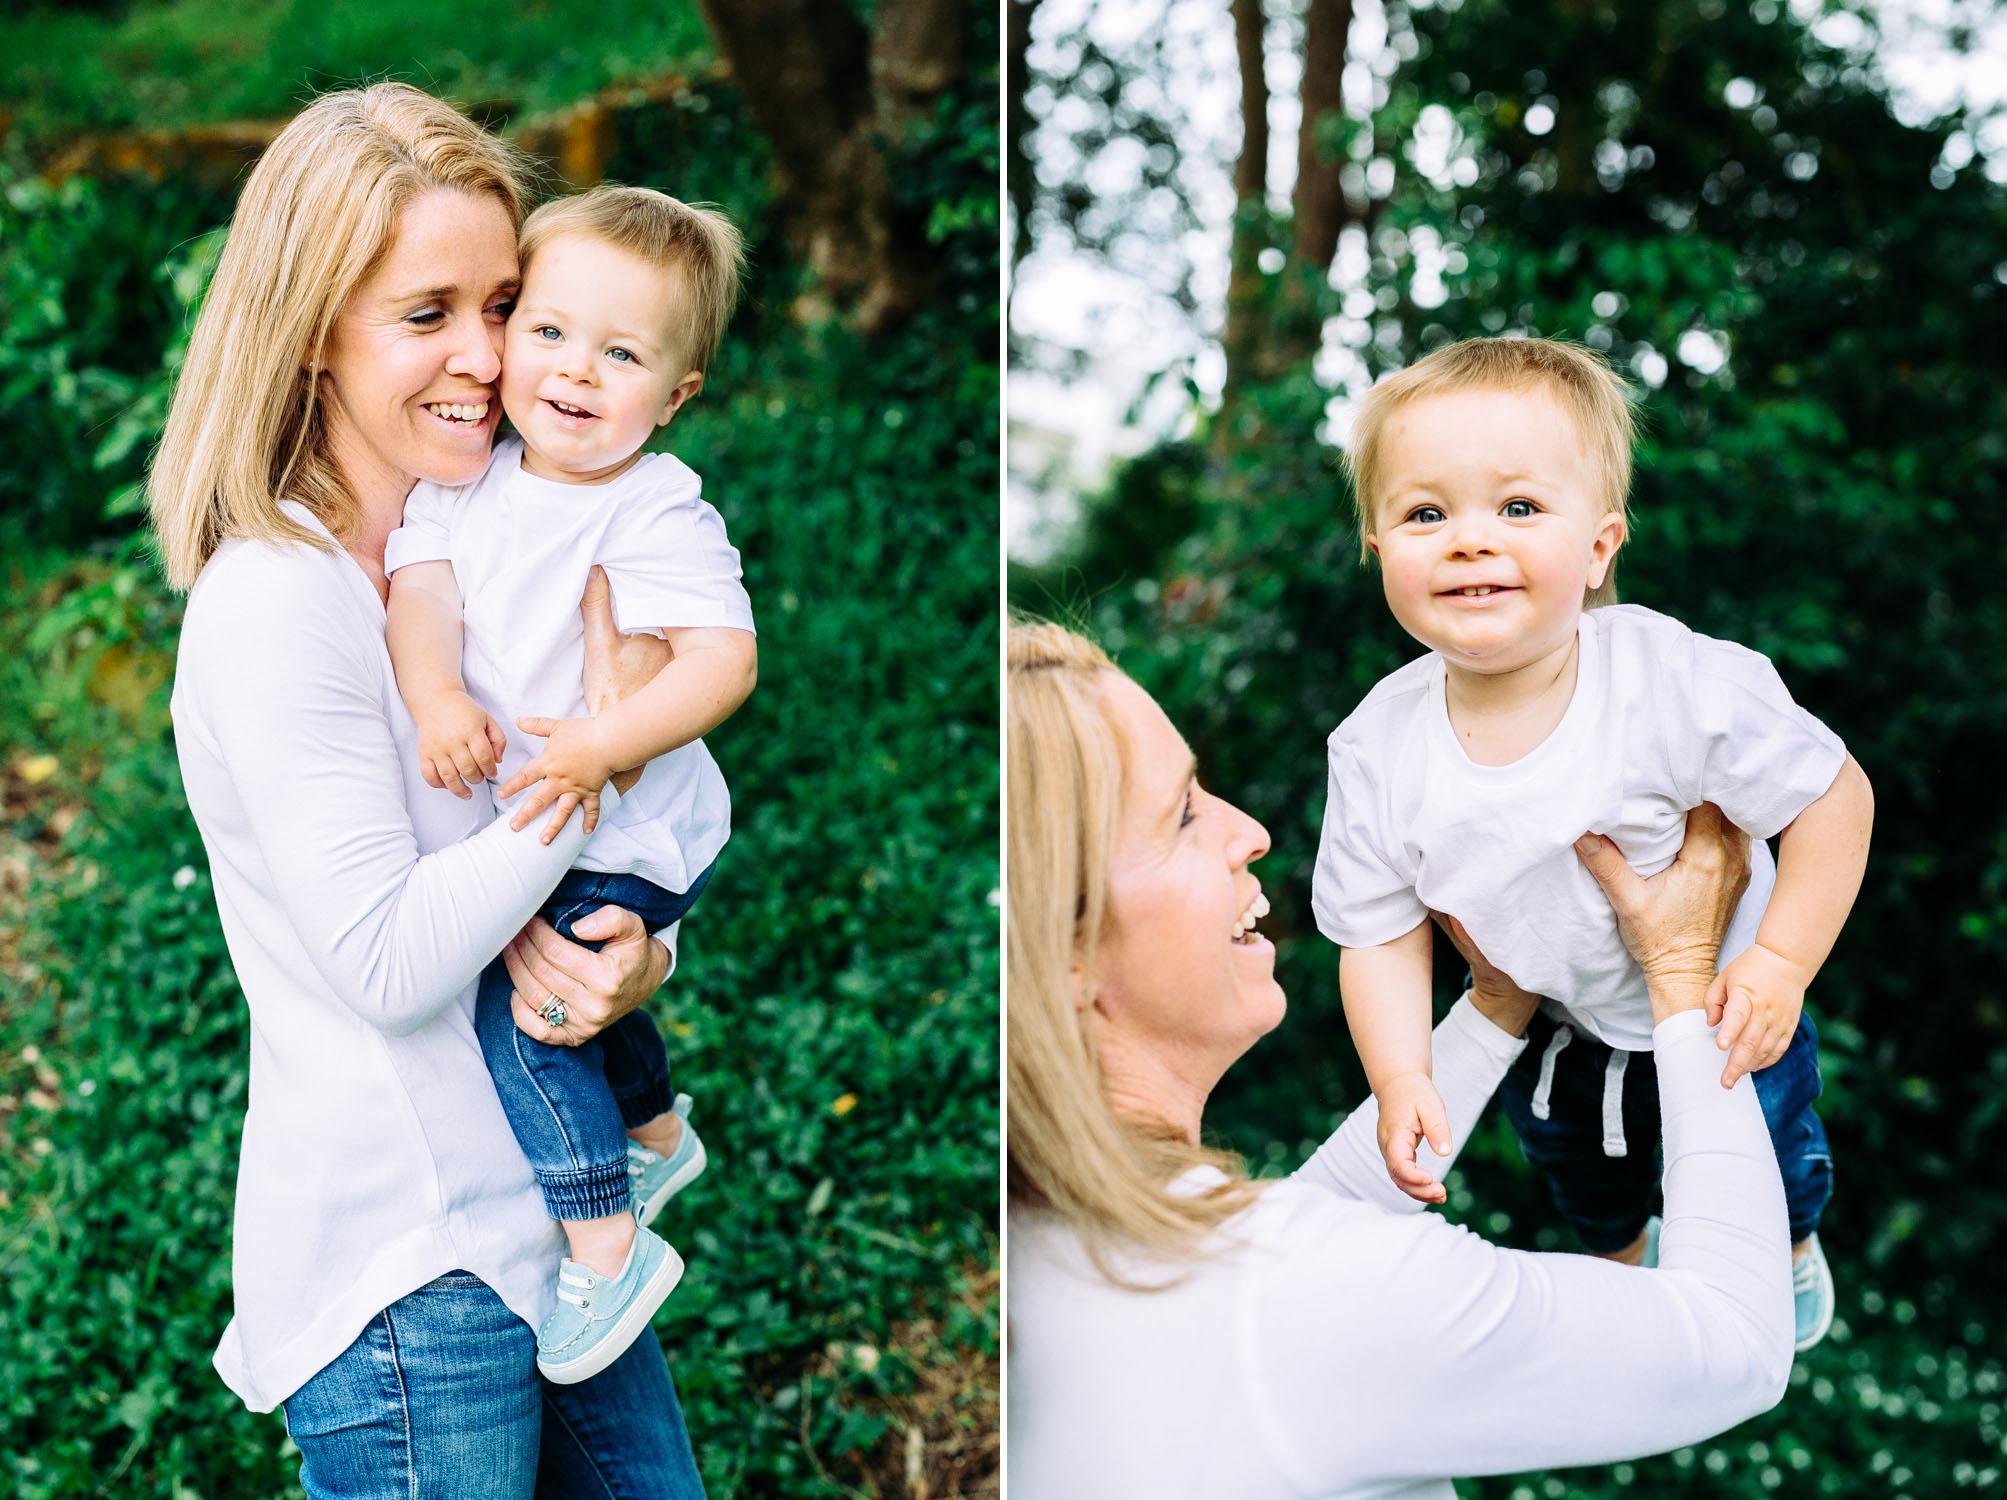 Liz family photos LR-59 copy.jpg